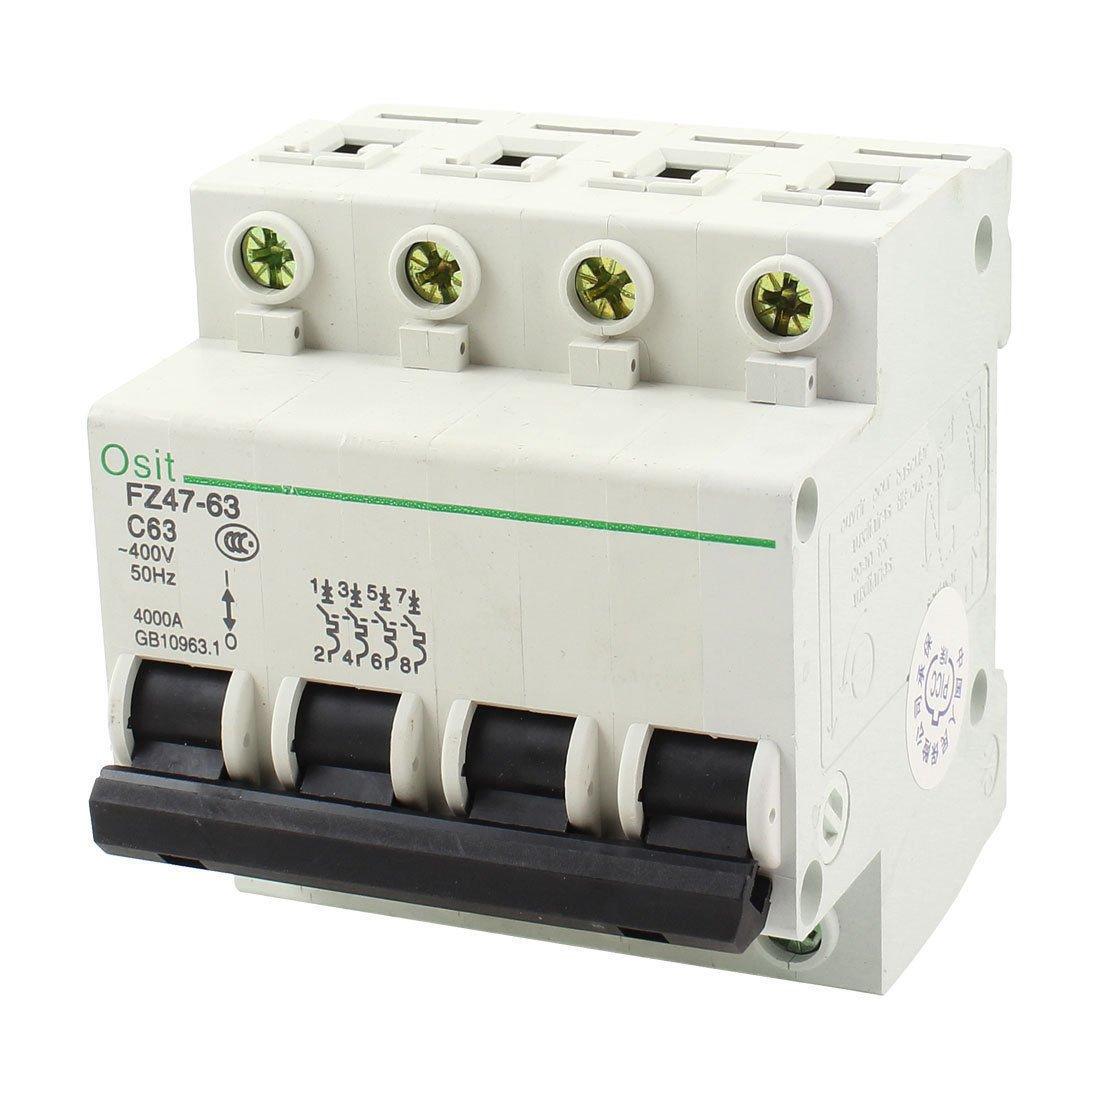 AC 400V 63A 4 Pole 4P On/Off Switch Miniature Circuit Breaker FZ47-63 C63